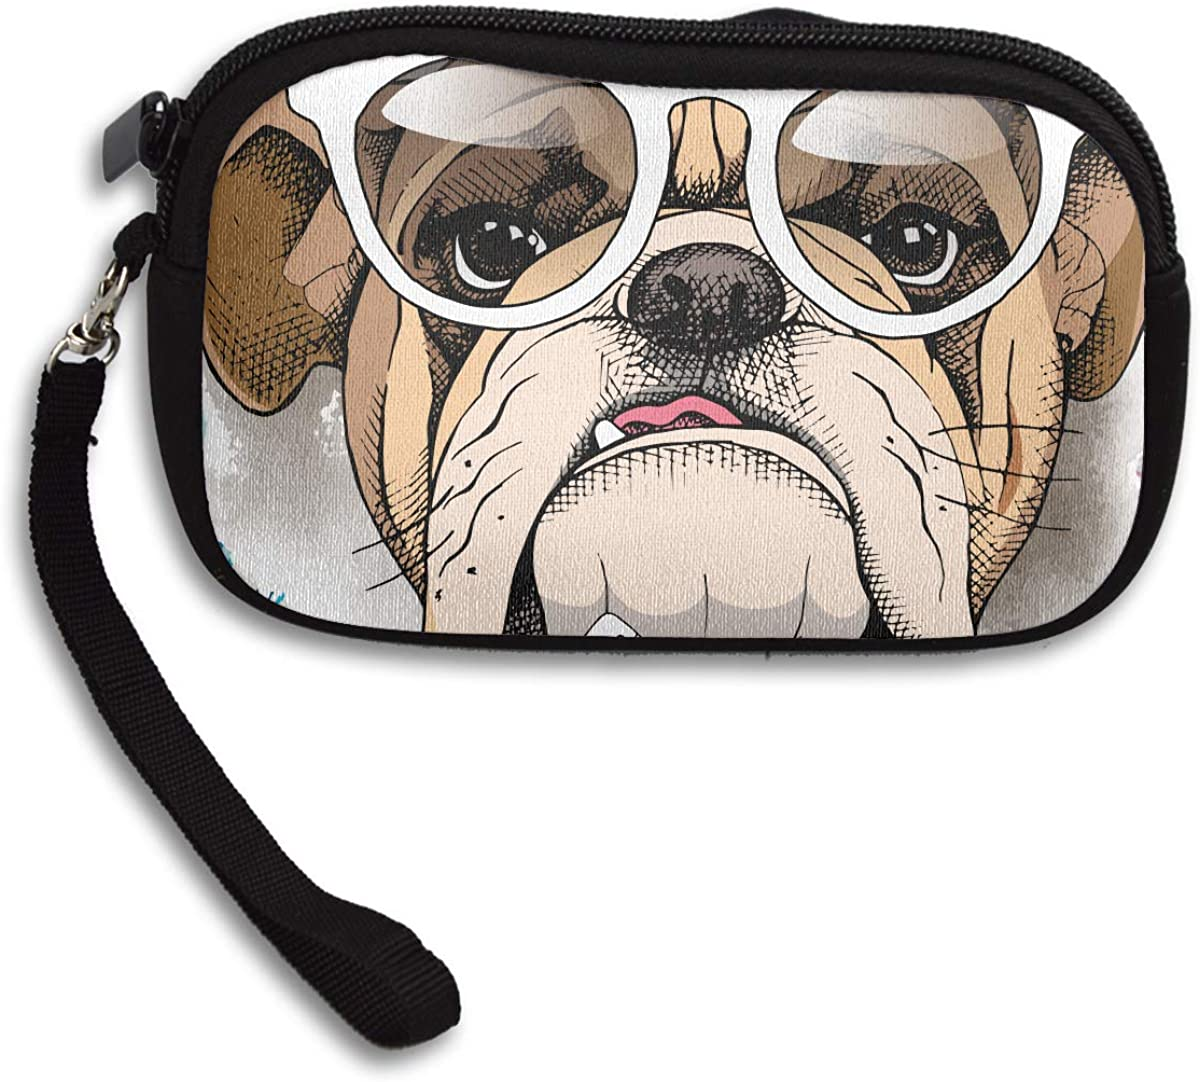 Bulldog Cool Deluxe Printing Small Purse Portable Receiving Bag